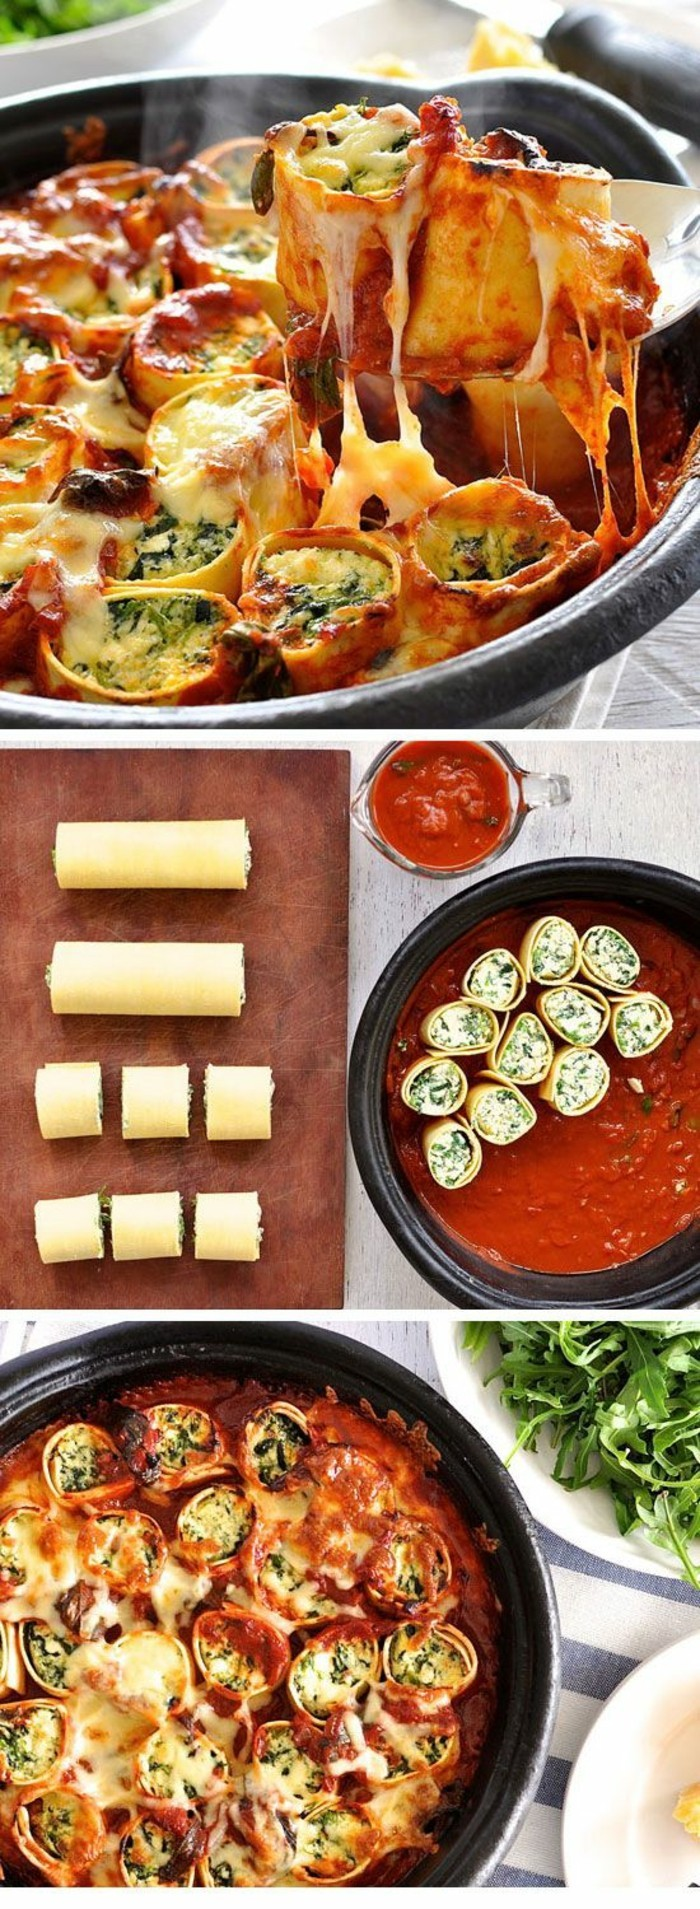 repas-romantique-facile-idee-soiree-romantique-inspiration